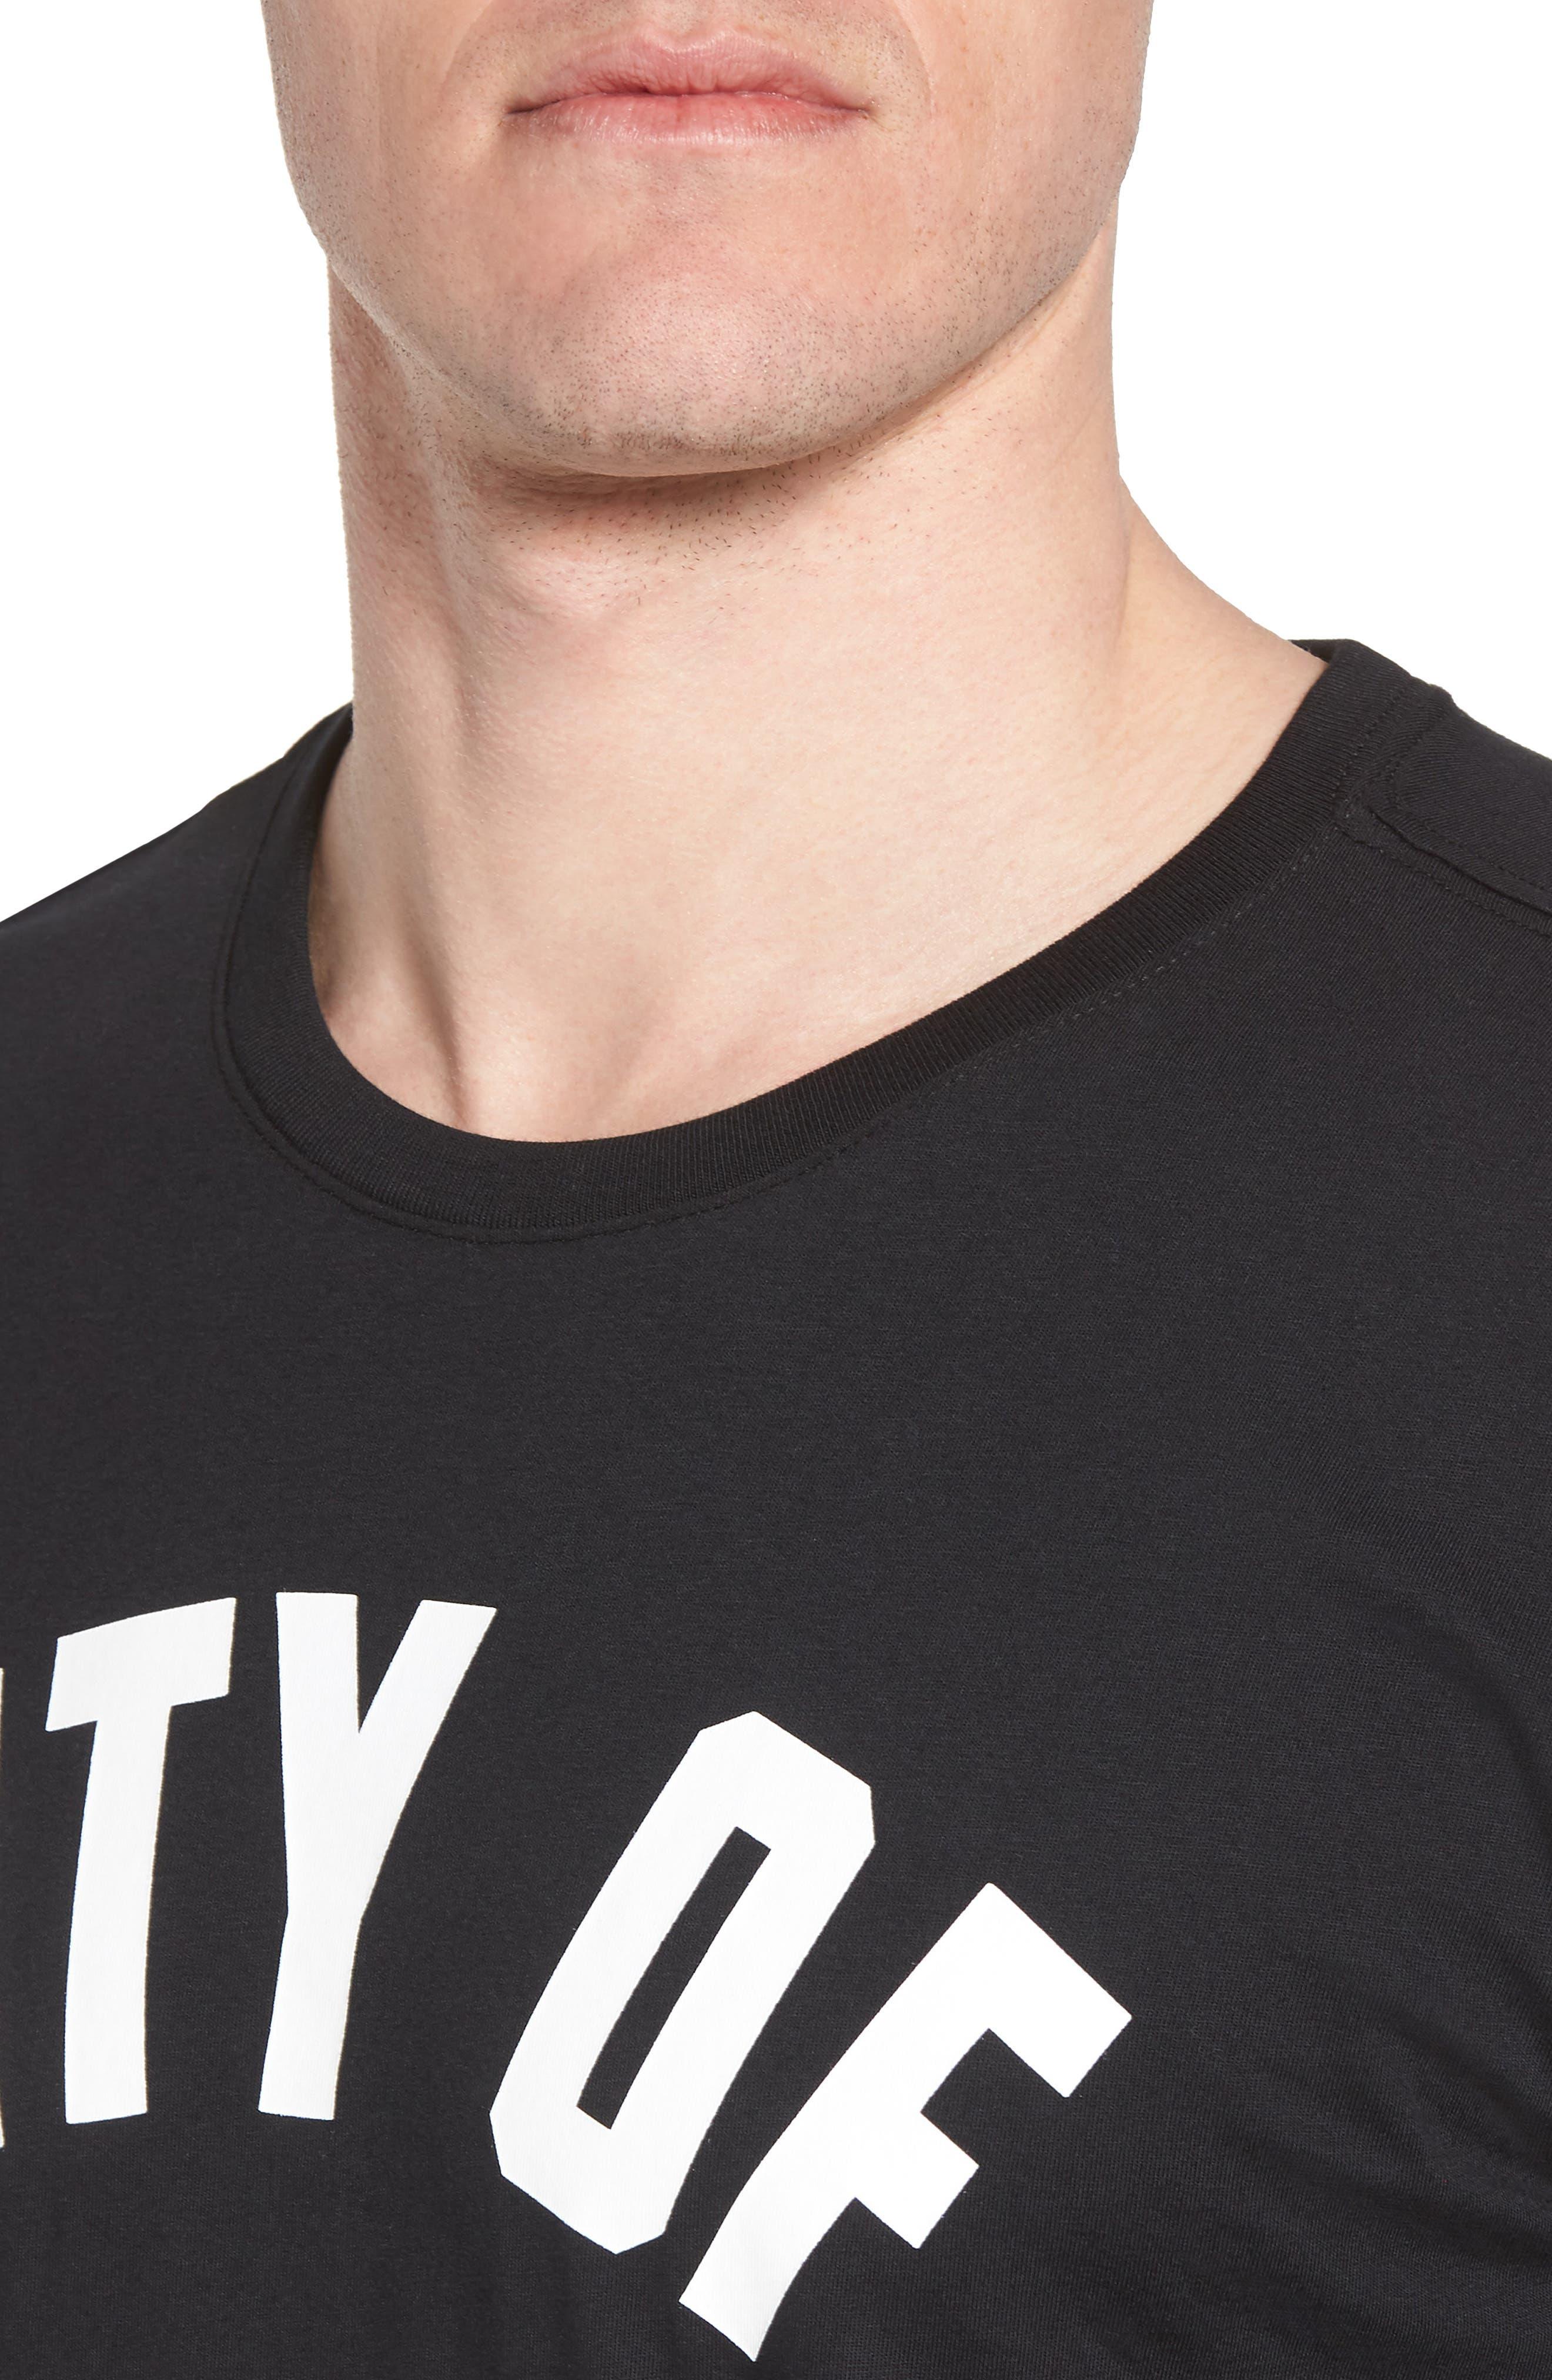 Sportswear City of Flight T-Shirt,                             Alternate thumbnail 4, color,                             Black/ White